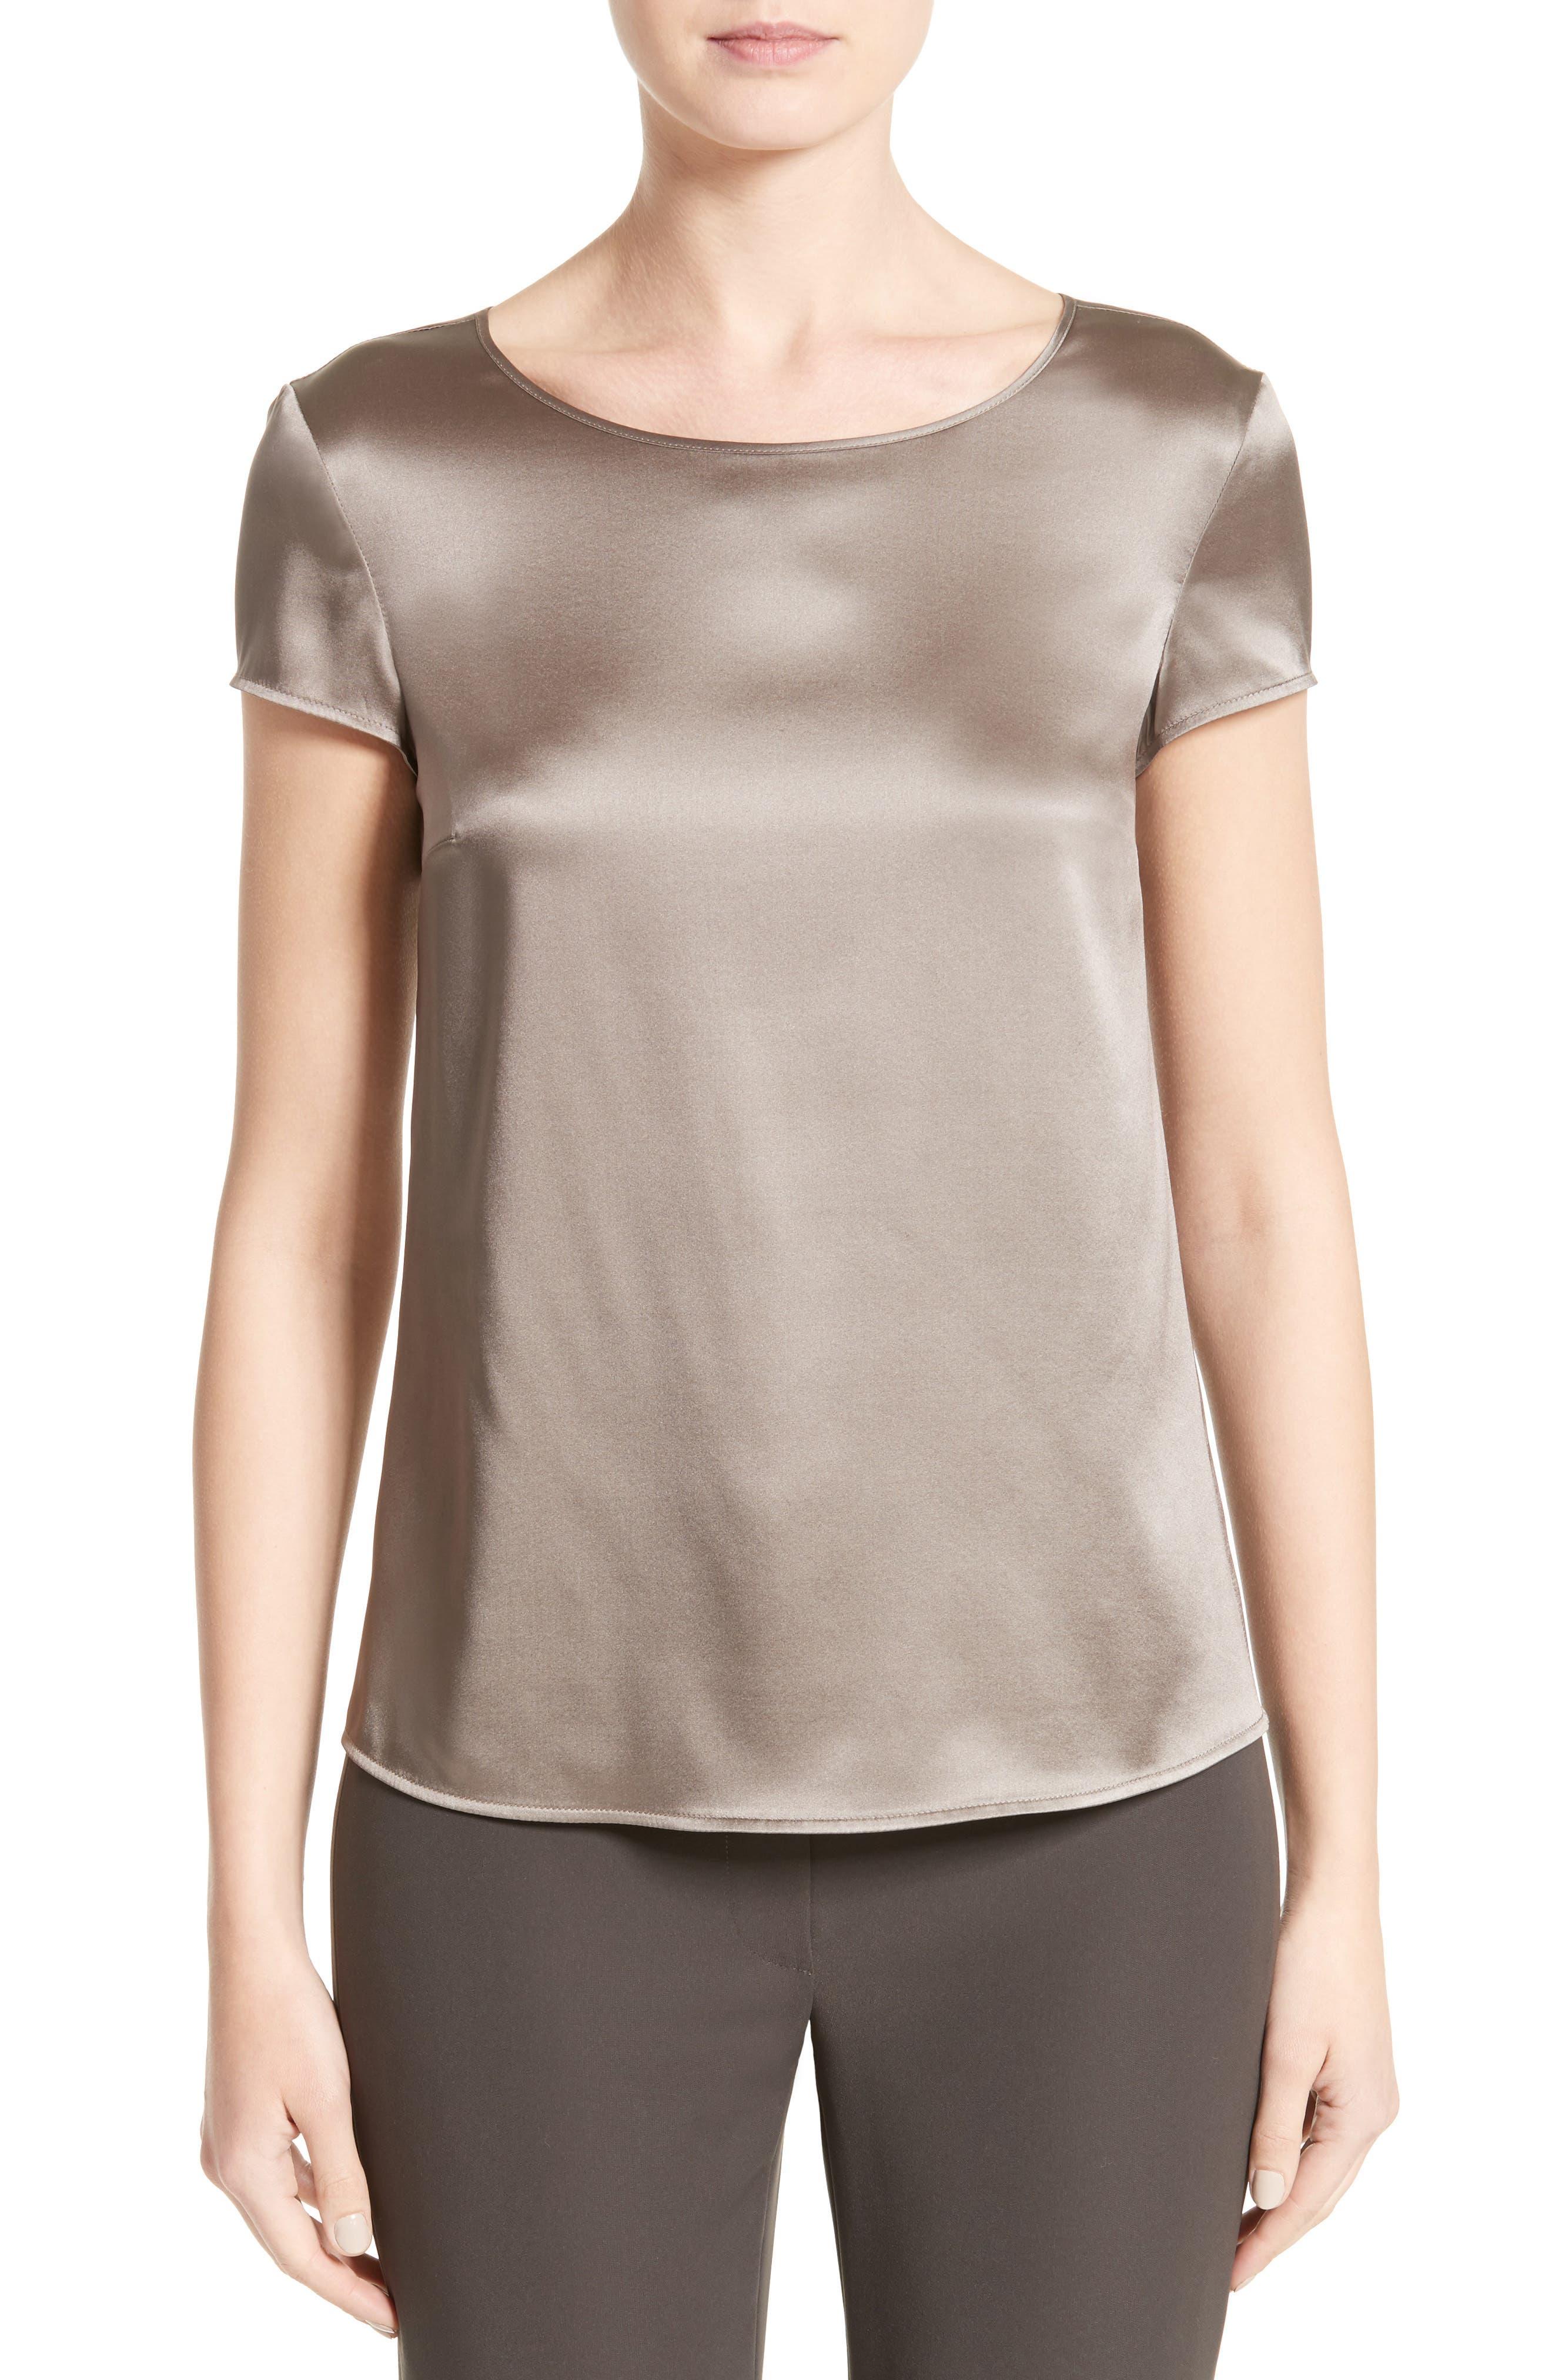 Alternate Image 1 Selected - Armani Collezioni Stretch Silk Satin Top